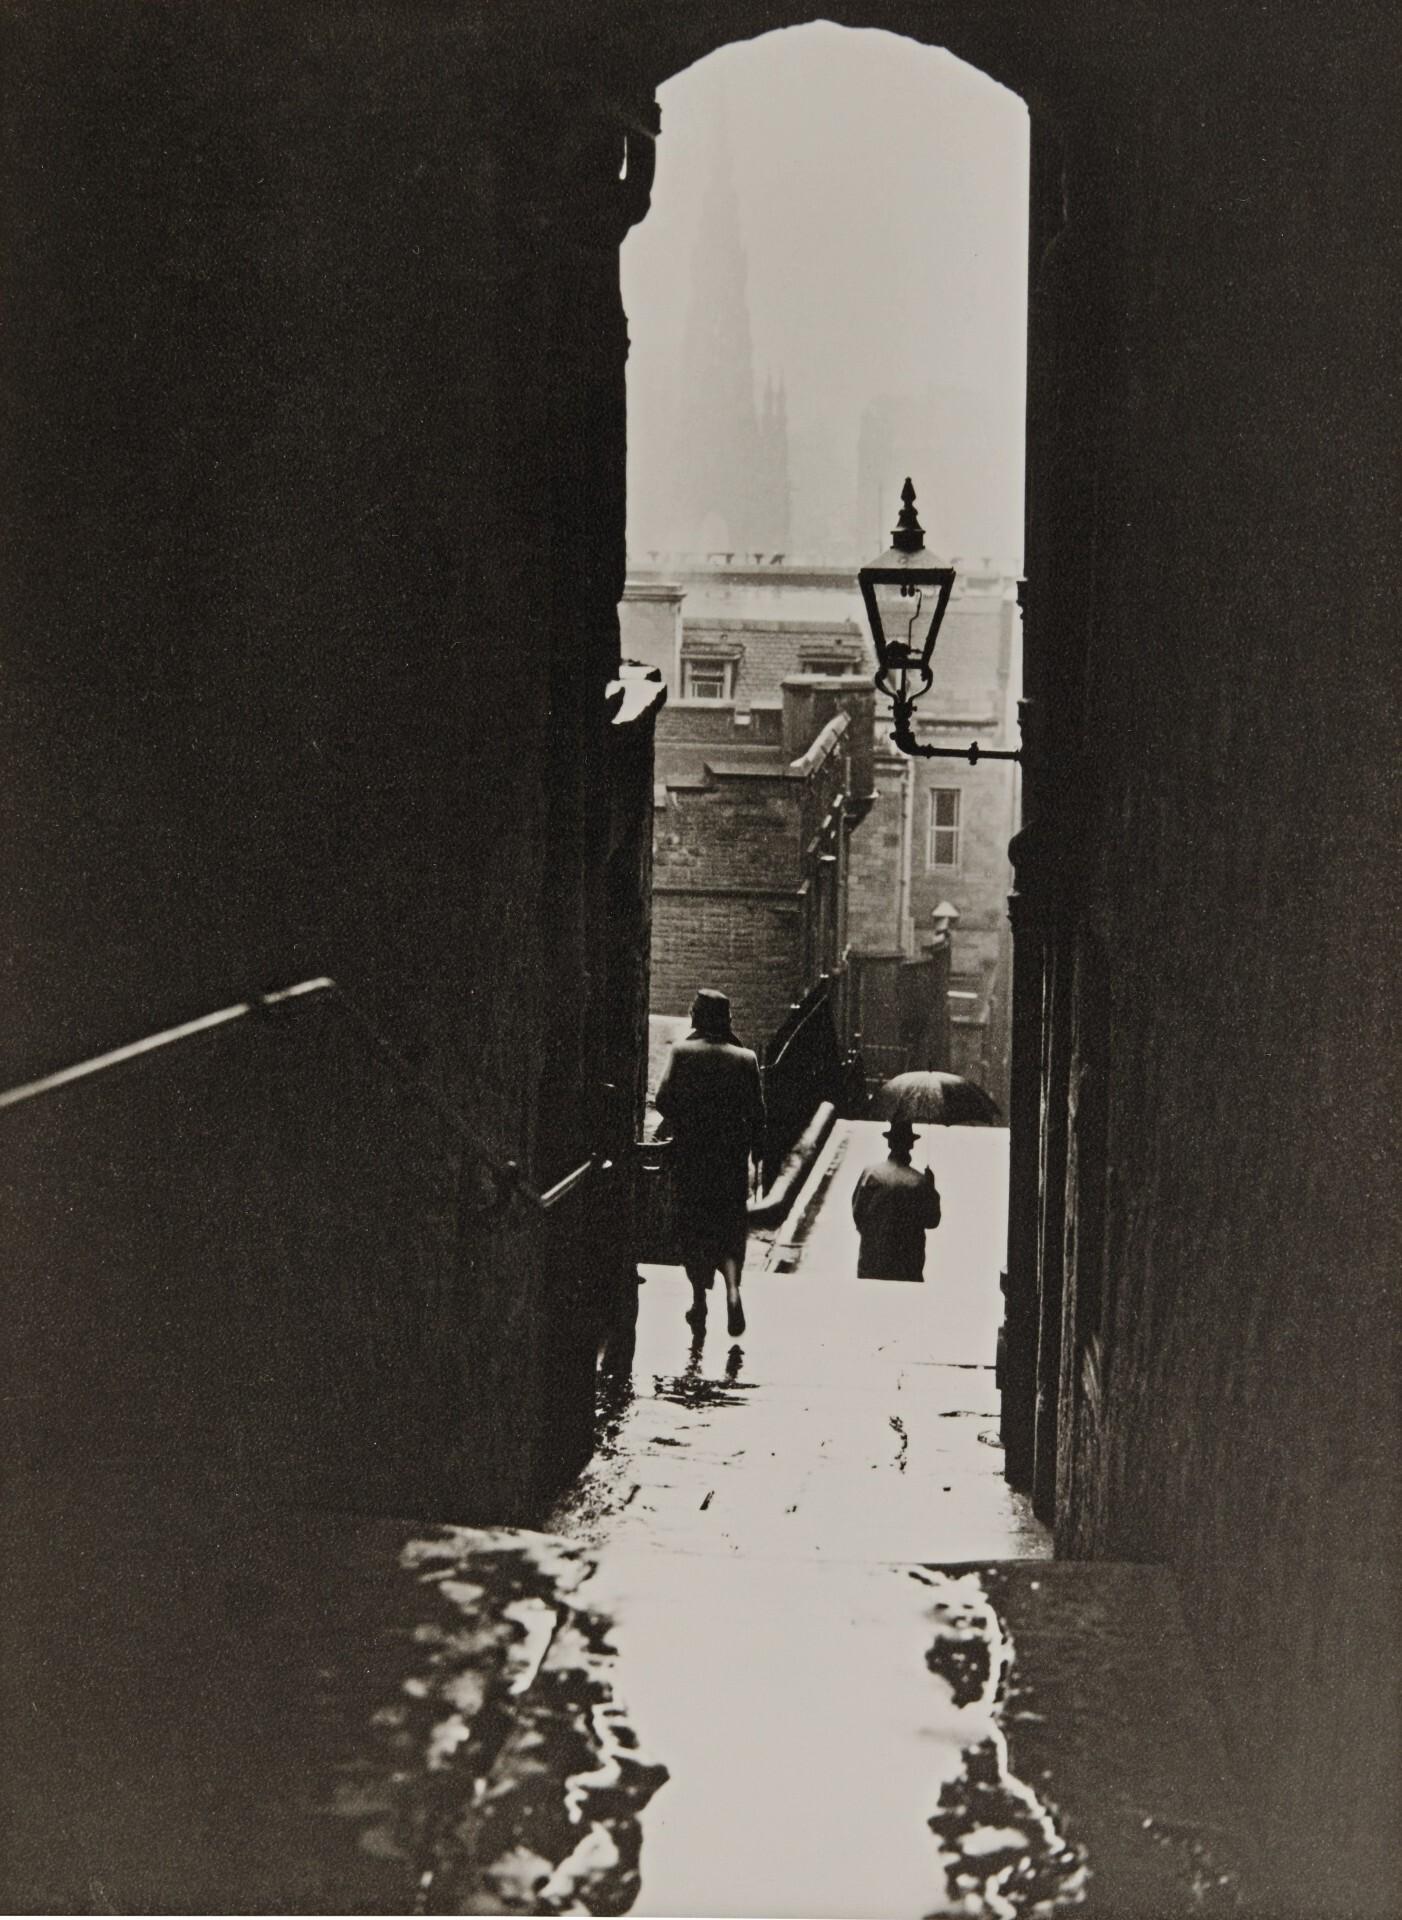 Эдинбург под дождём, ок. 1950. Фотограф Норман Паркинсон